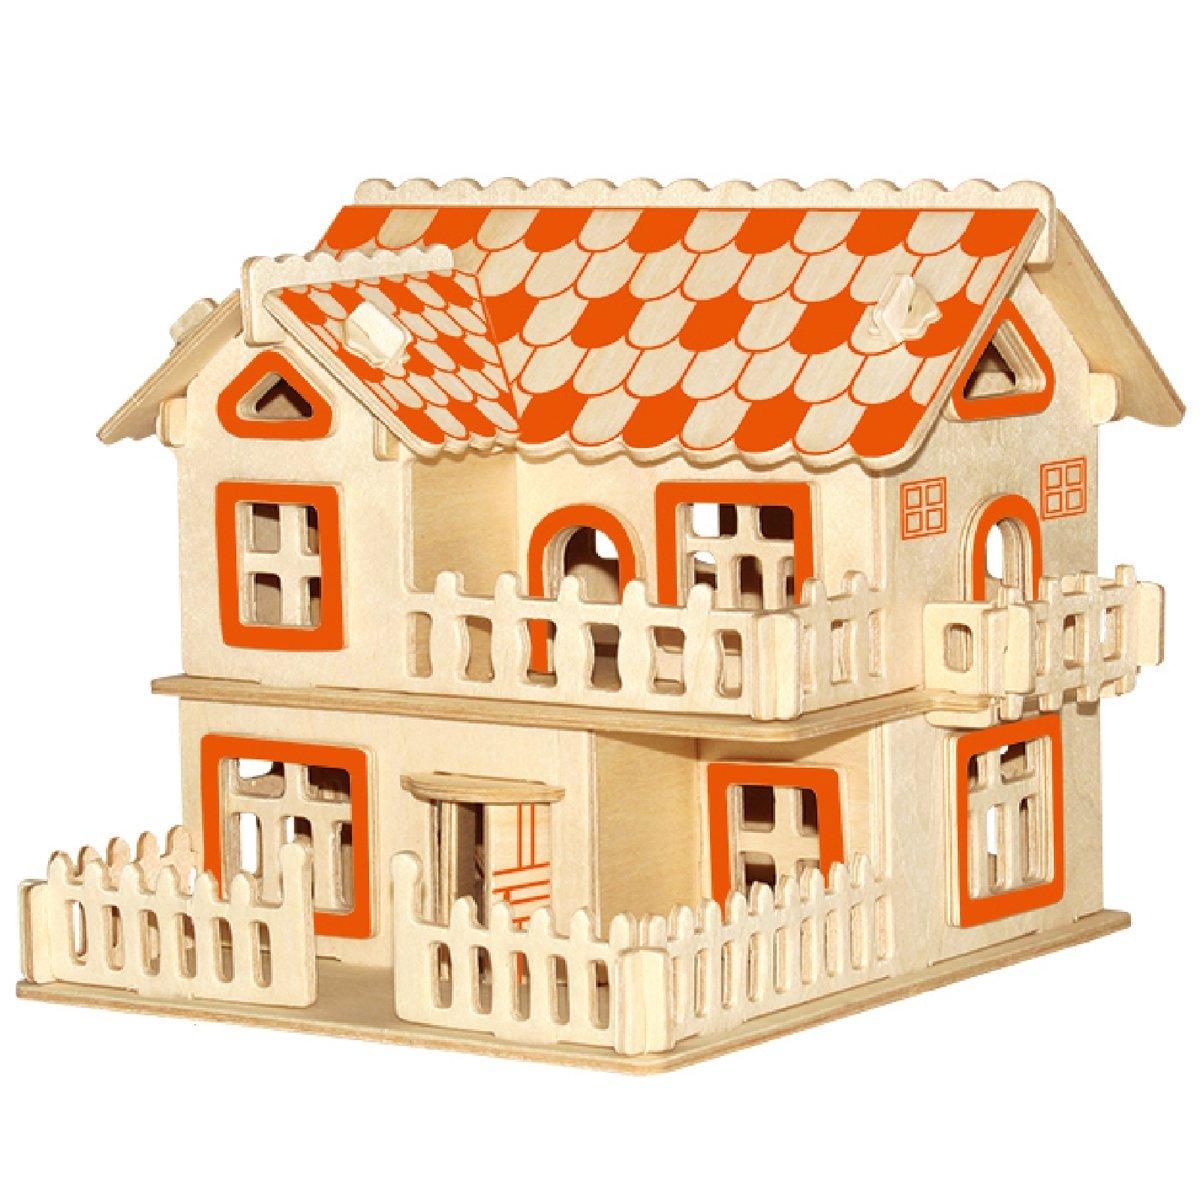 Smilelove 3D Assembly Wooden Building Puzzle European Villas A Jigsaw Puzzle